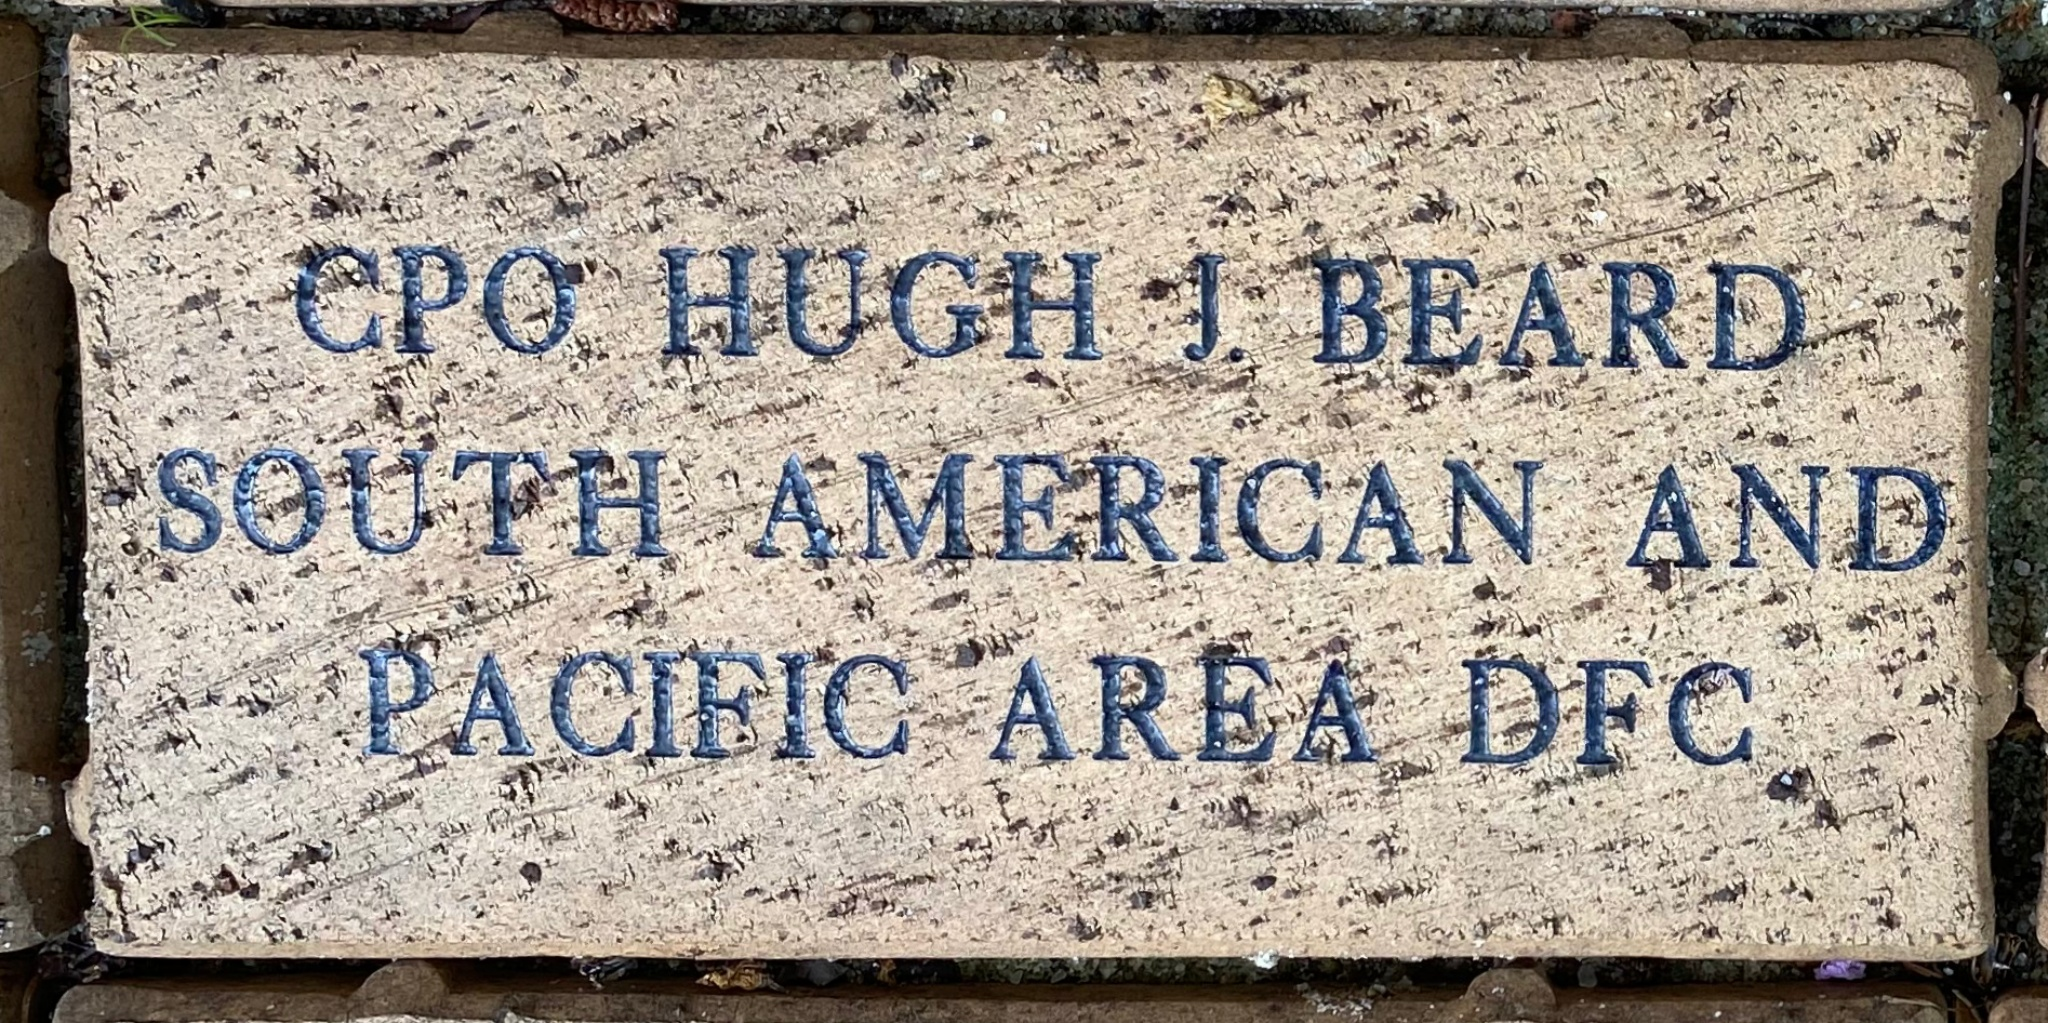 CPO HUGH J. BEARD SOUTH AMERICAN AND PACIFIC AREAS DFC